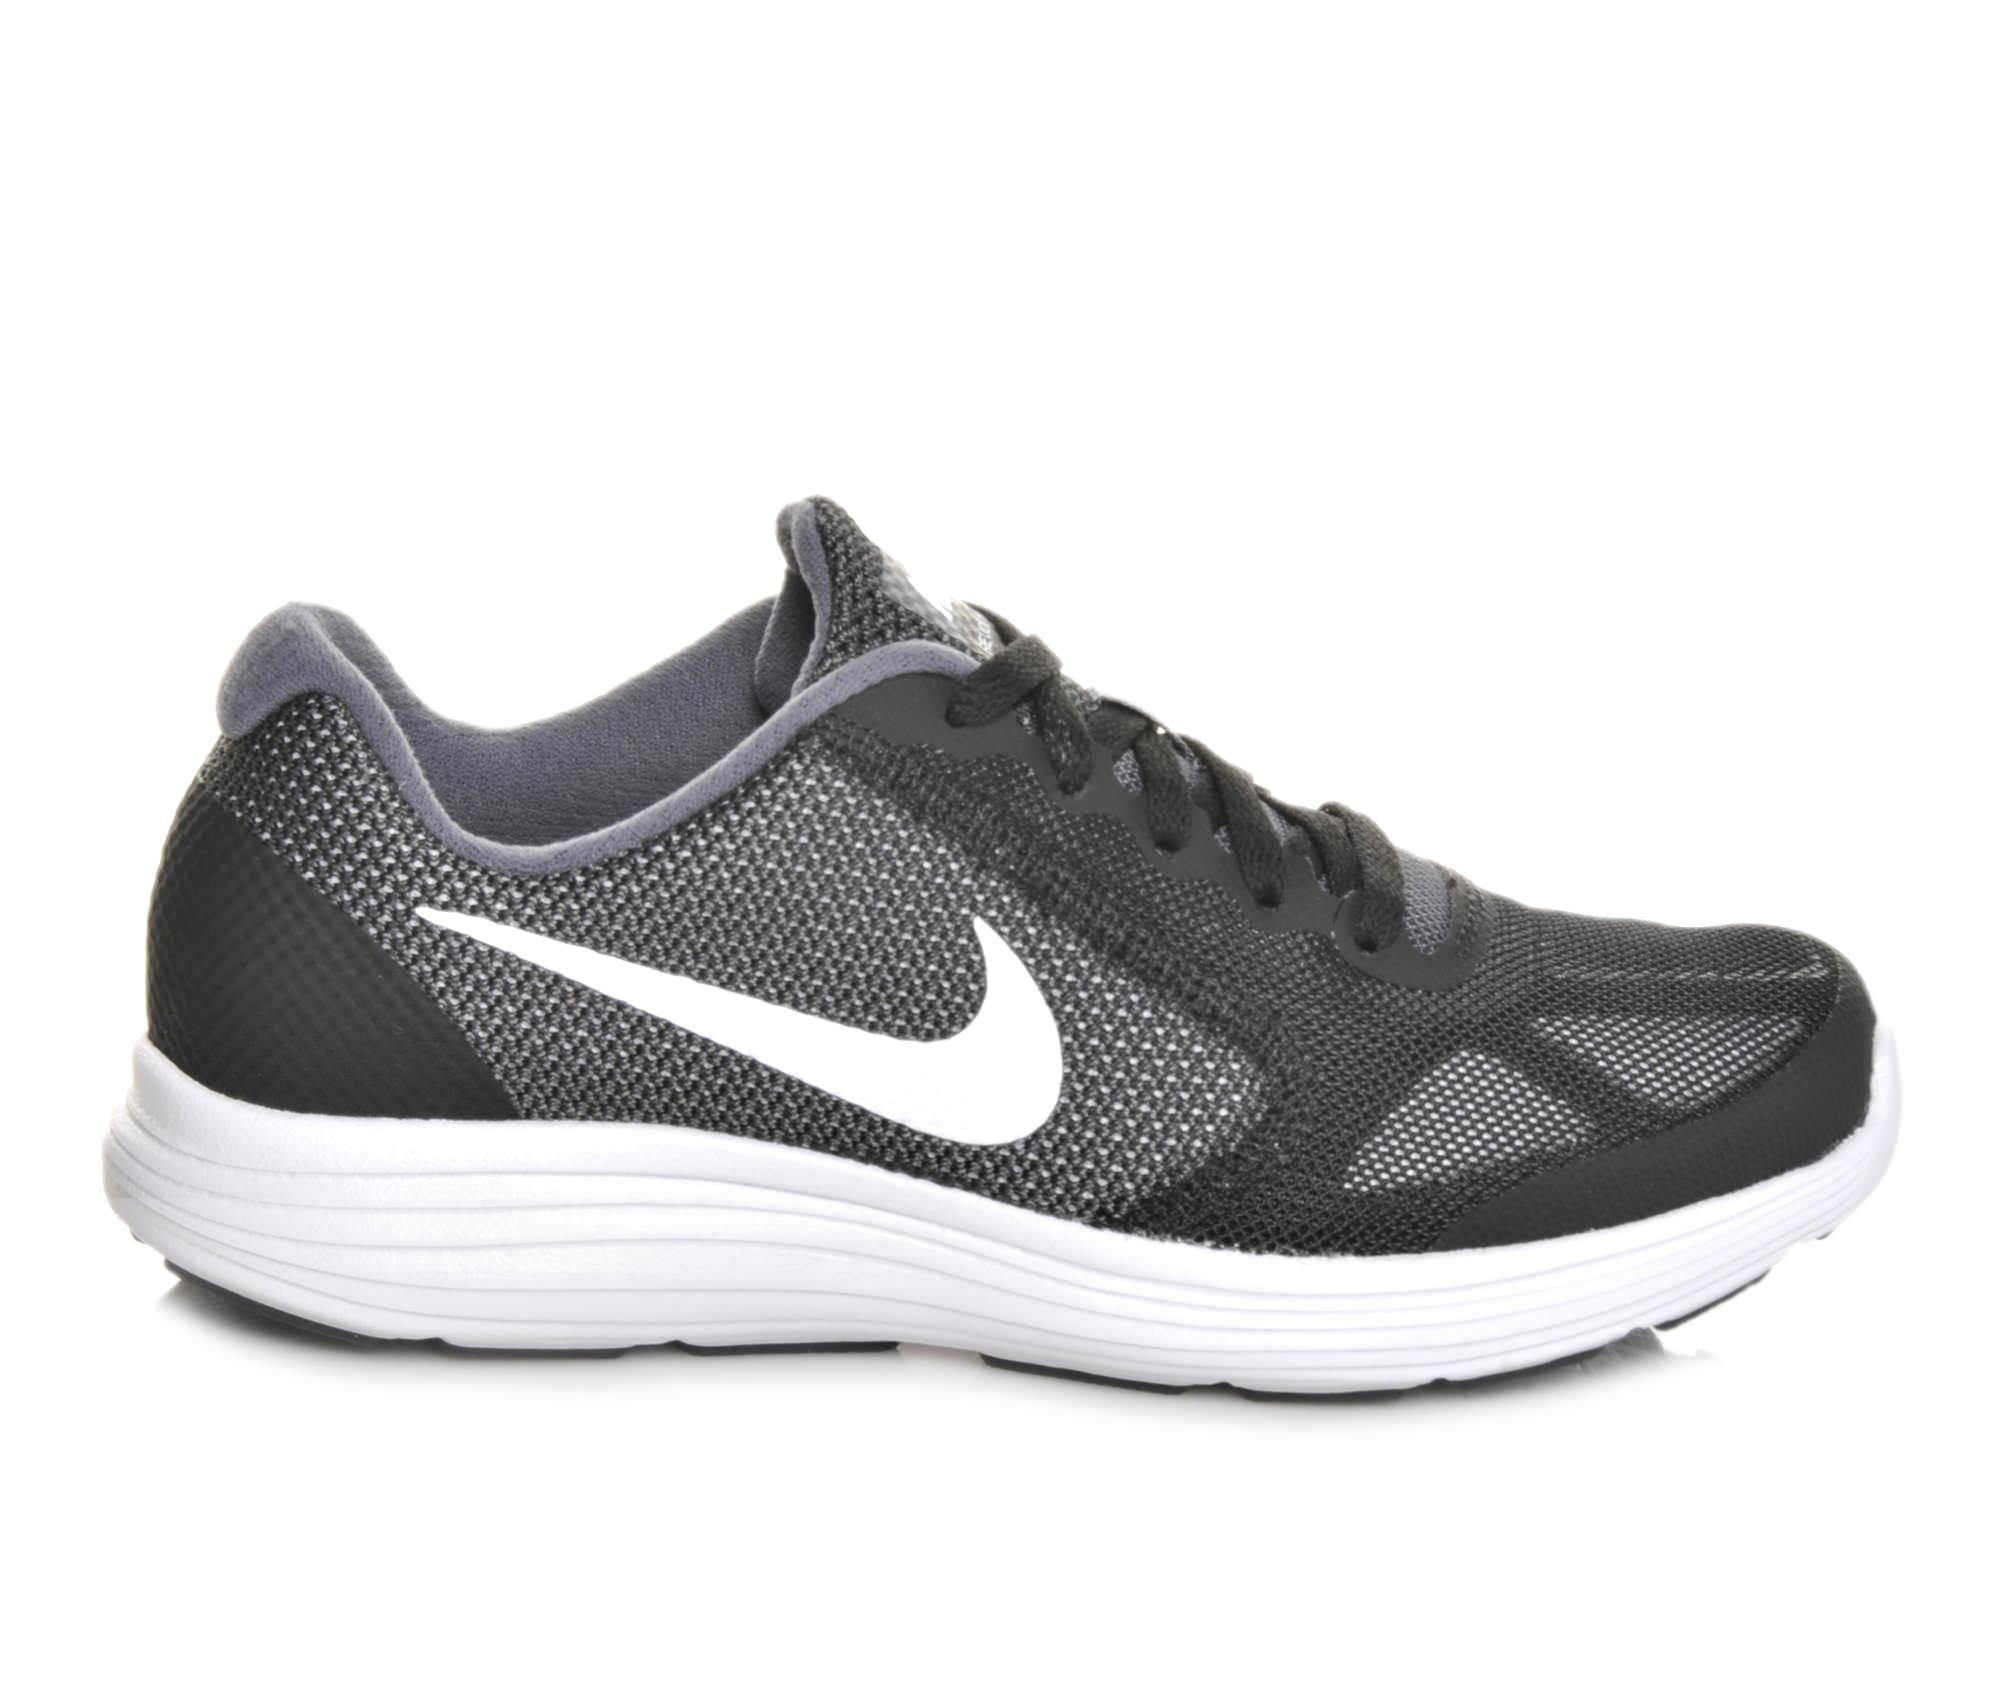 Boys' Nike Revolution 3 Athletic Shoes (Grey)